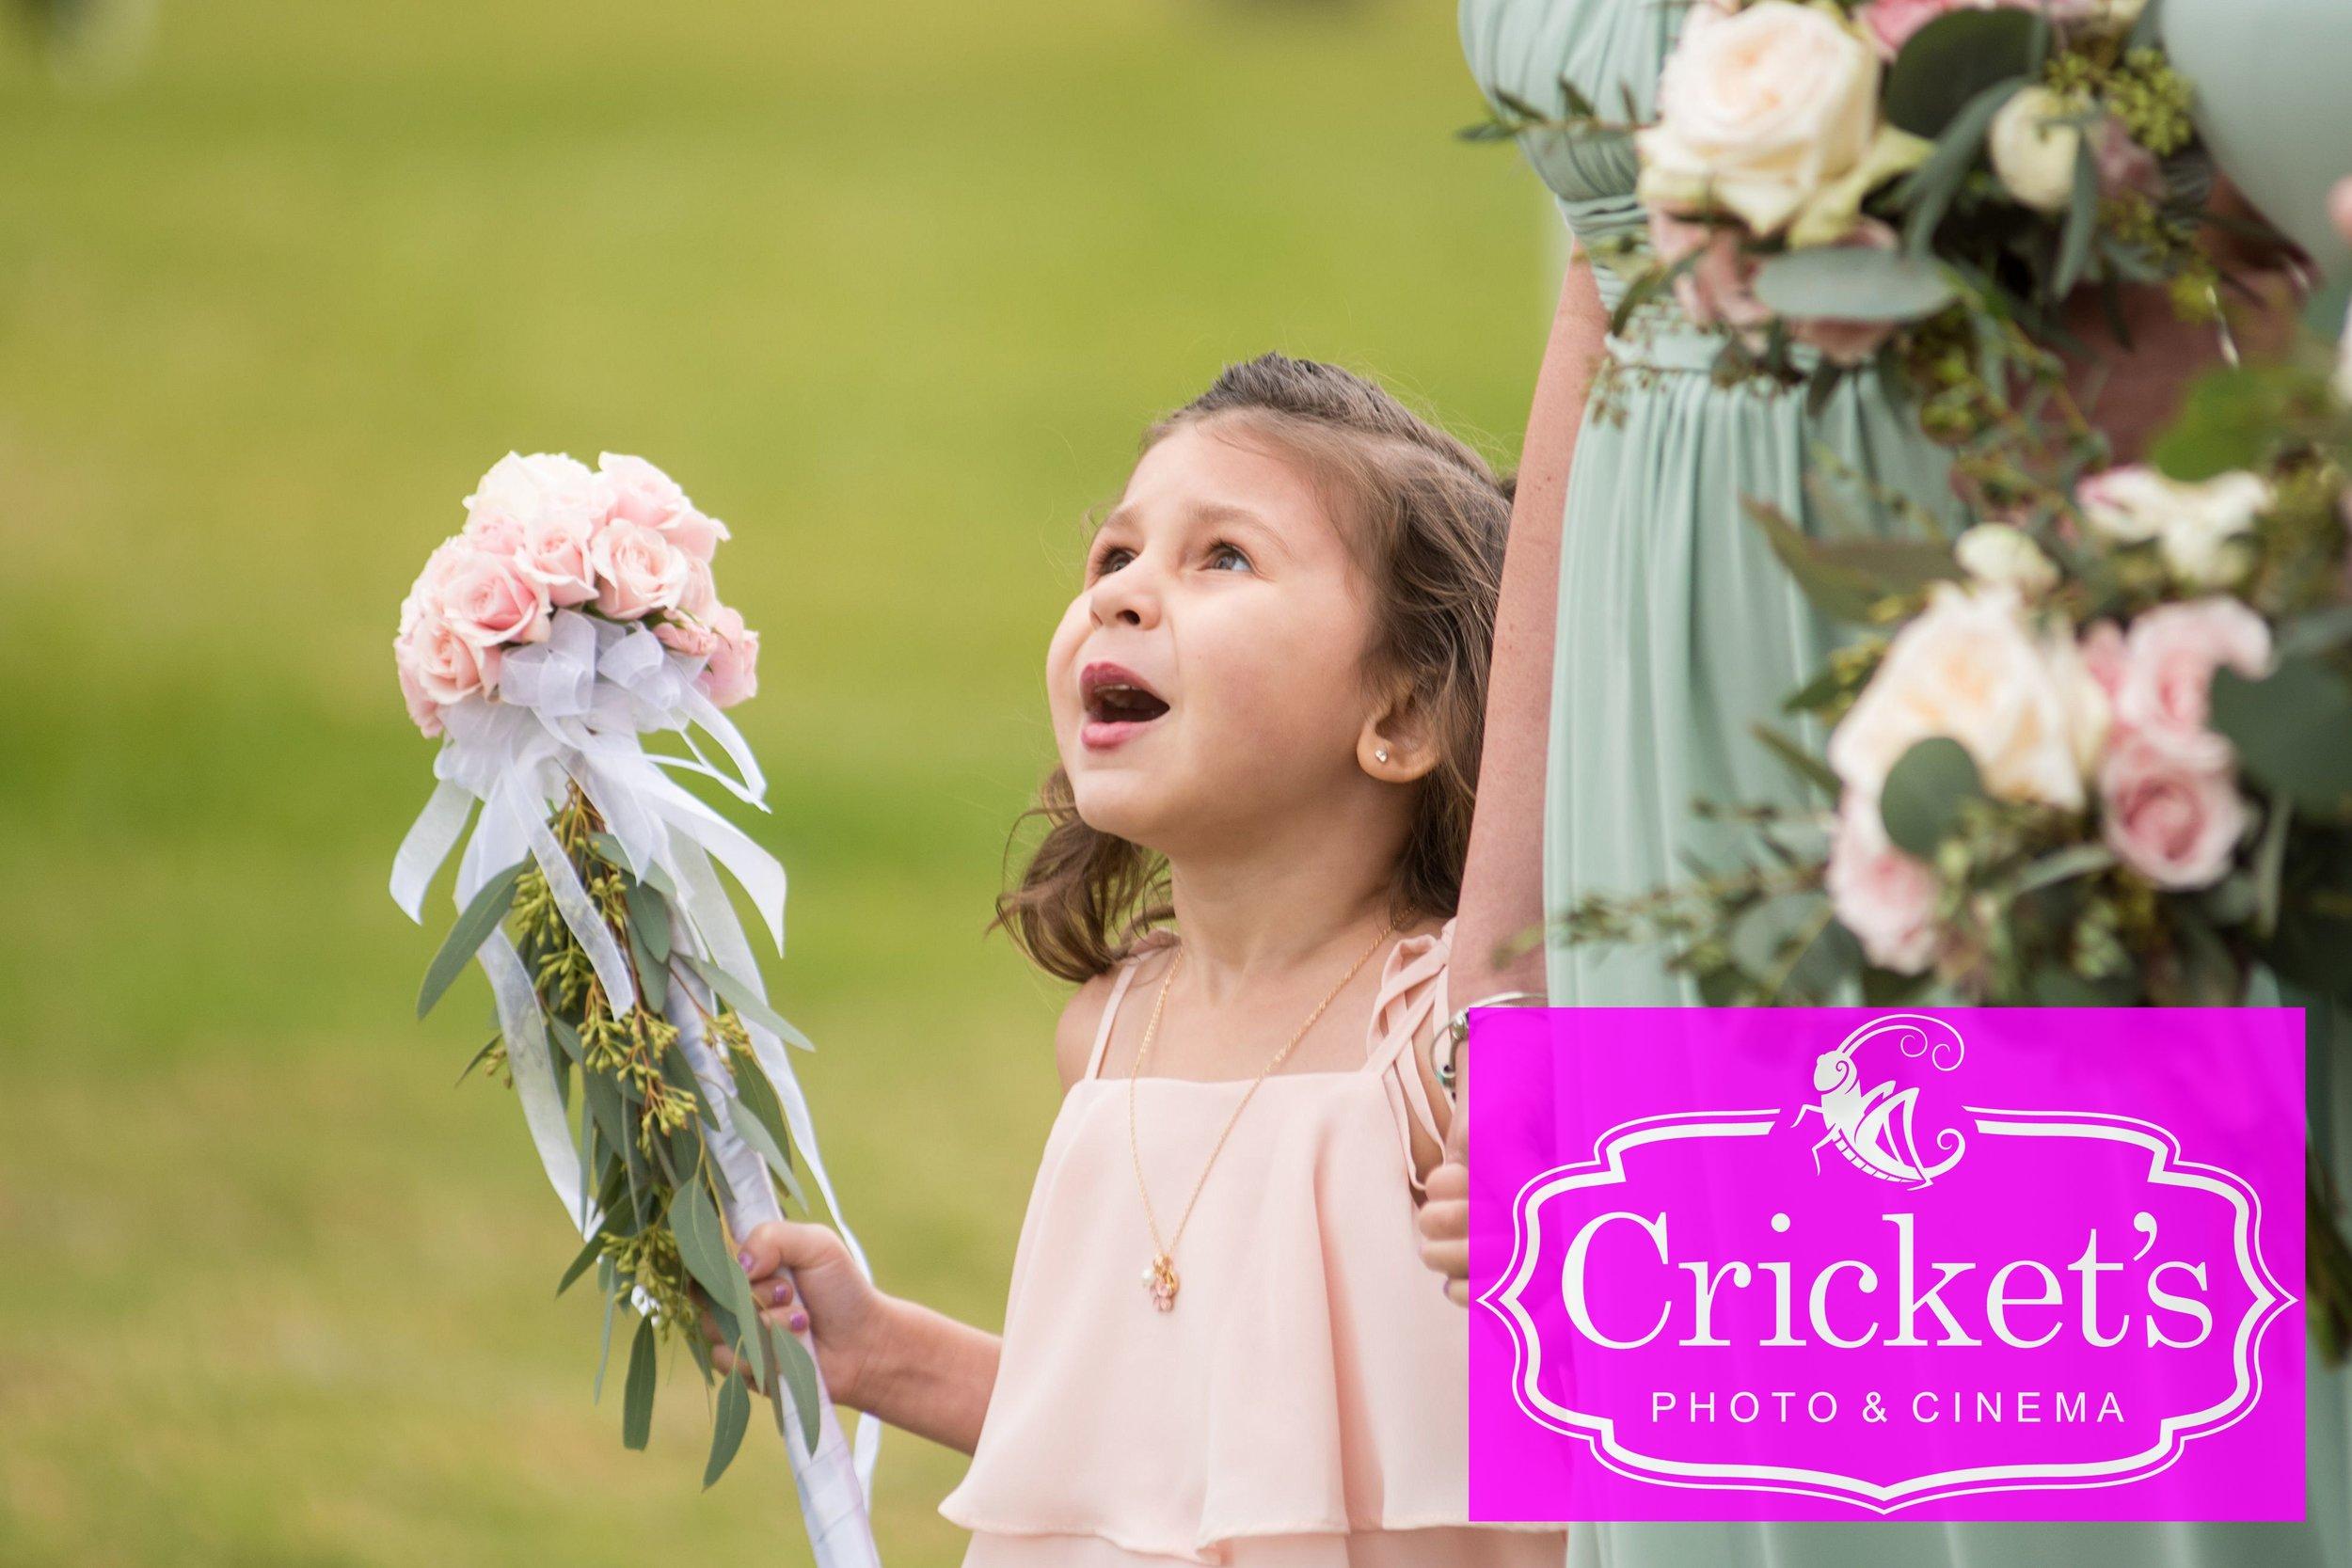 Bluegrass Chic - Cricket's Photo